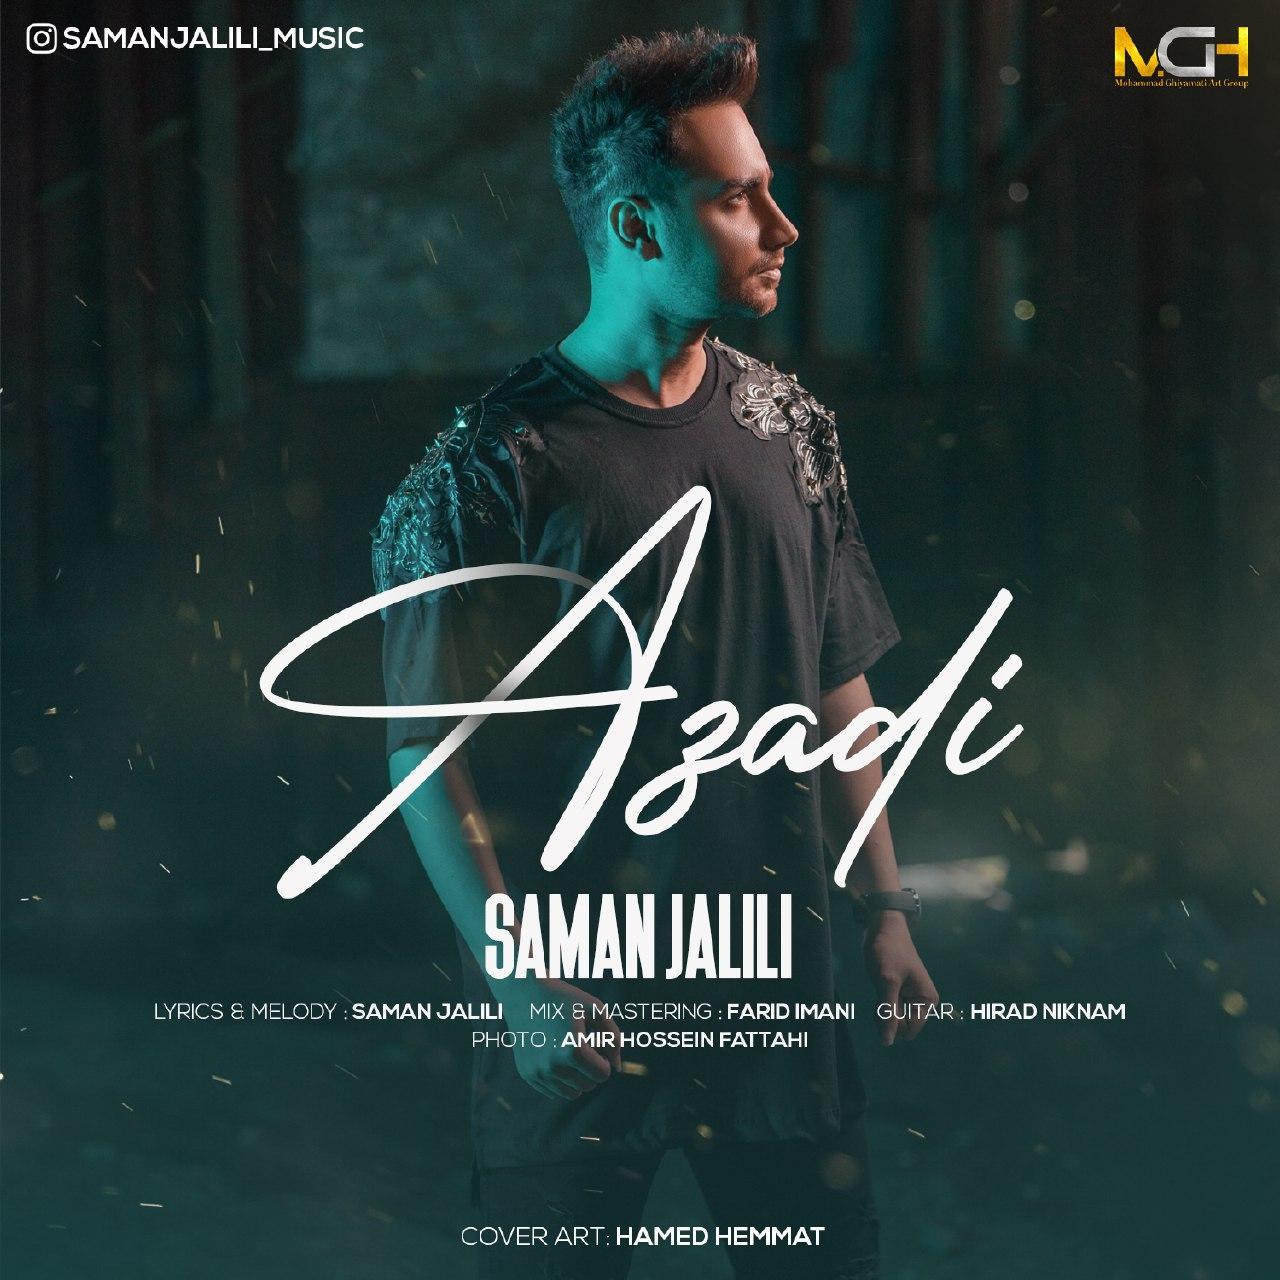 Saman Jalili - Azadi - دانلود آهنگ سامان جلیلی به نام آزادی